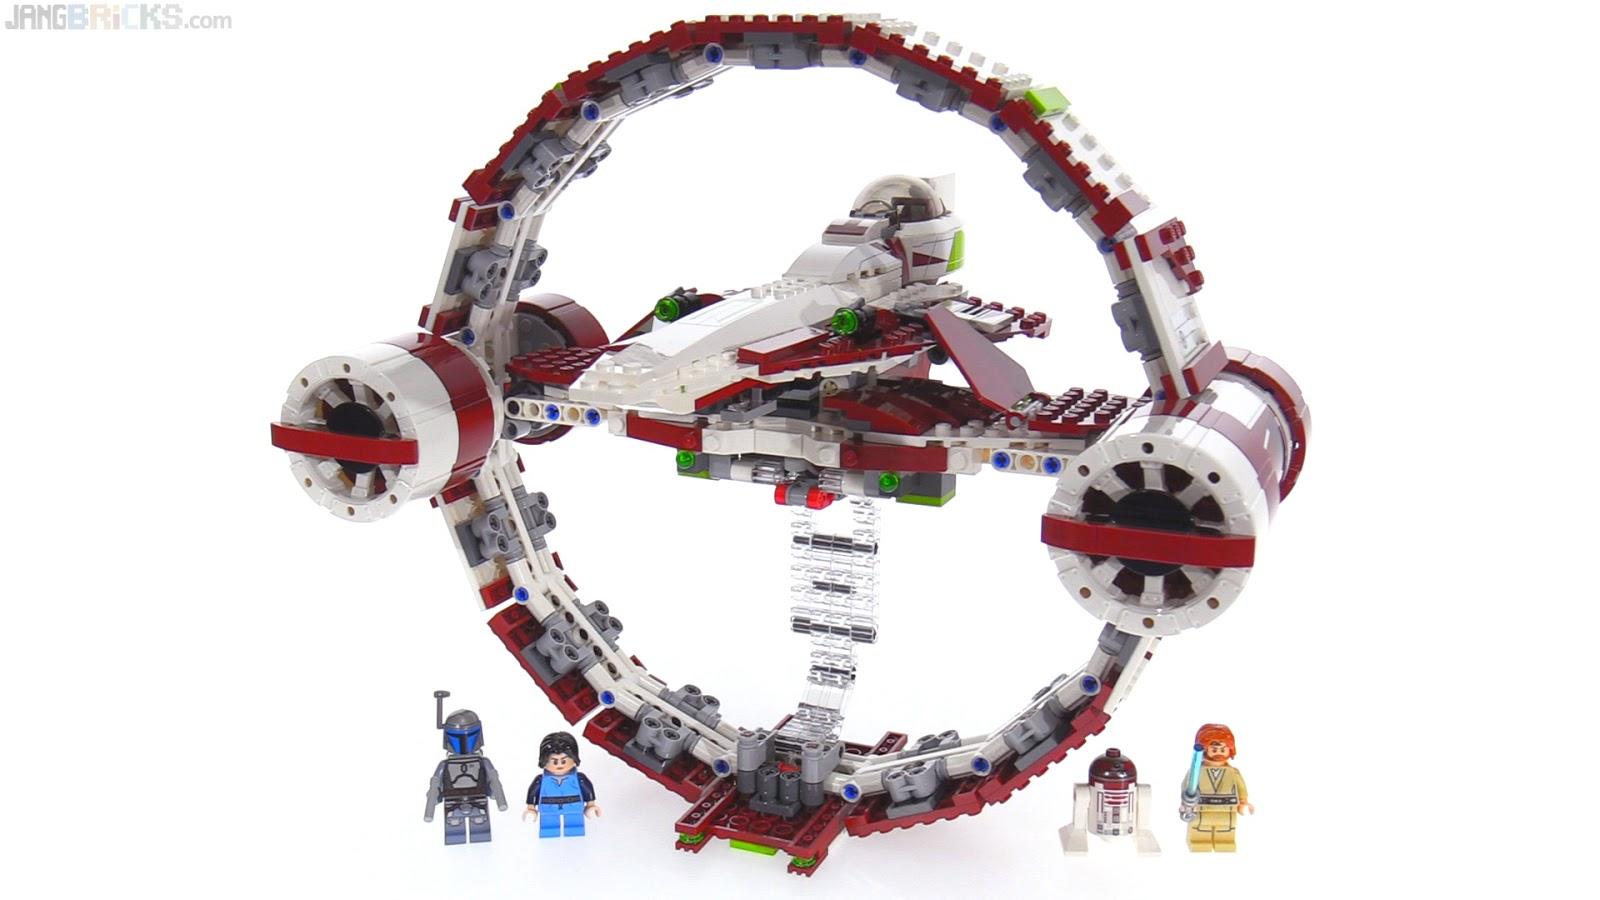 LEGO Star Wars Jedi Starfighter + Hyperdrive review 75191